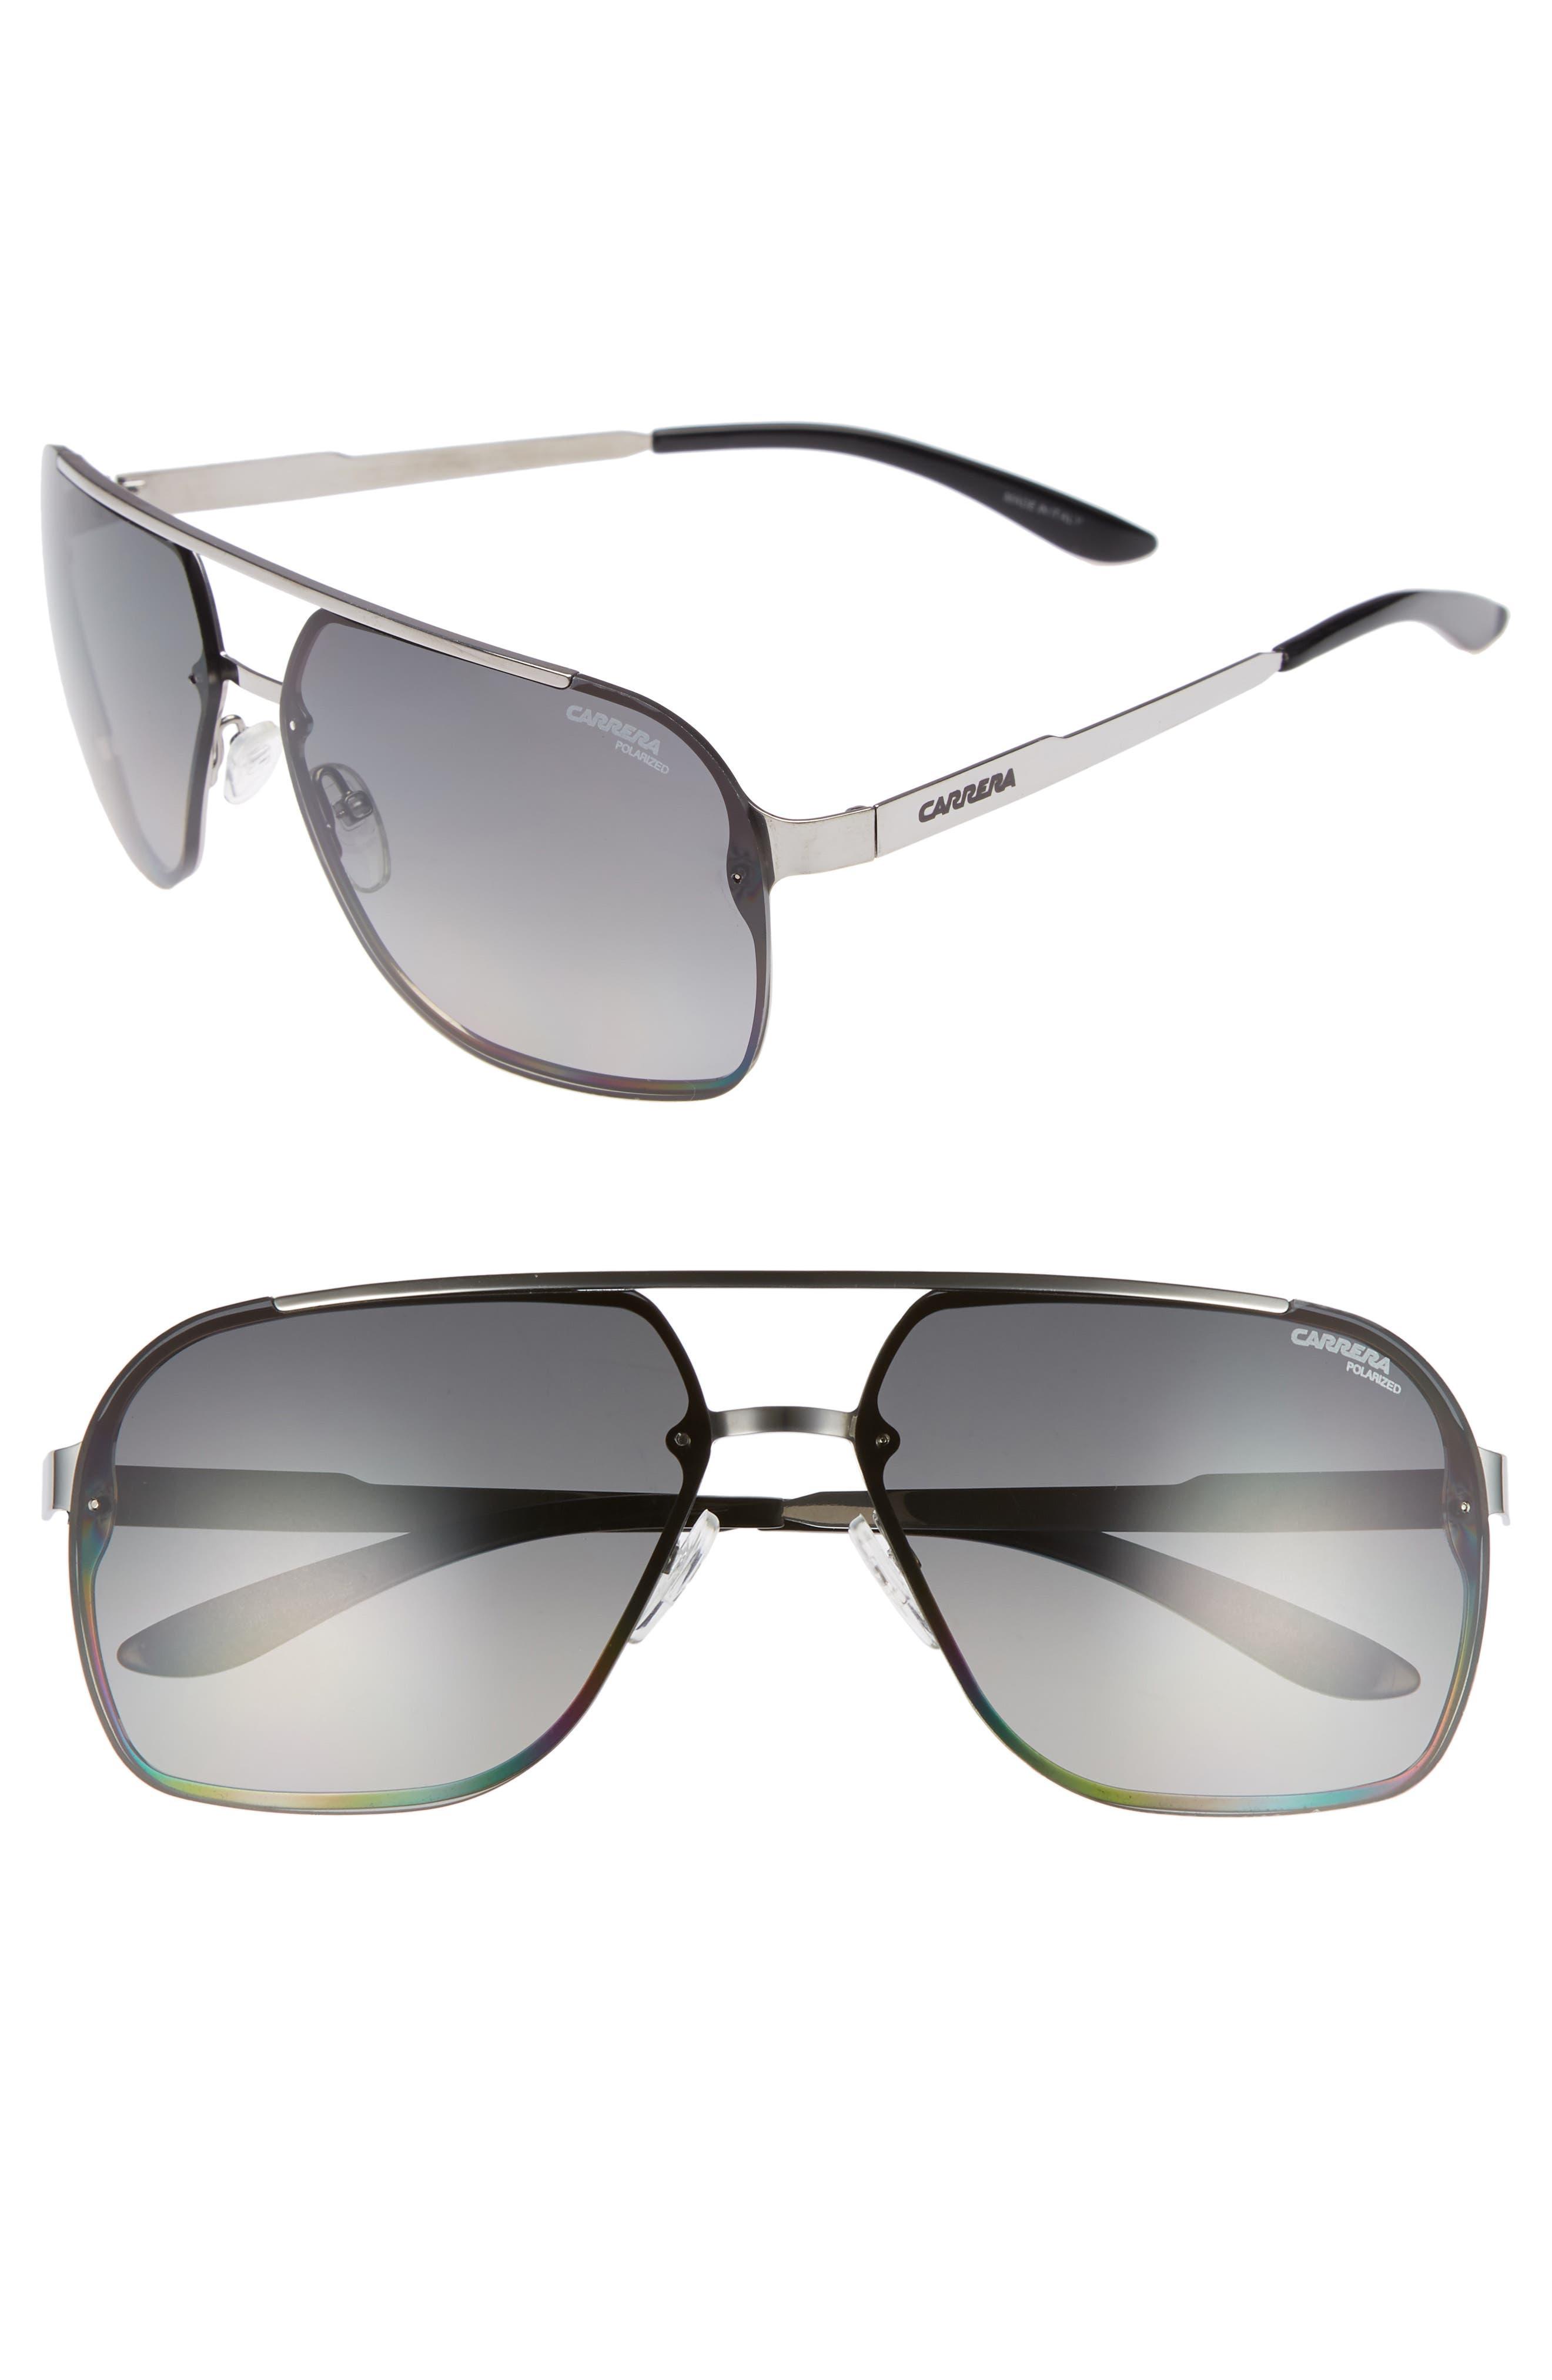 Carrera Eyewear Navigator Polarized Sunglasses - Ruthenium